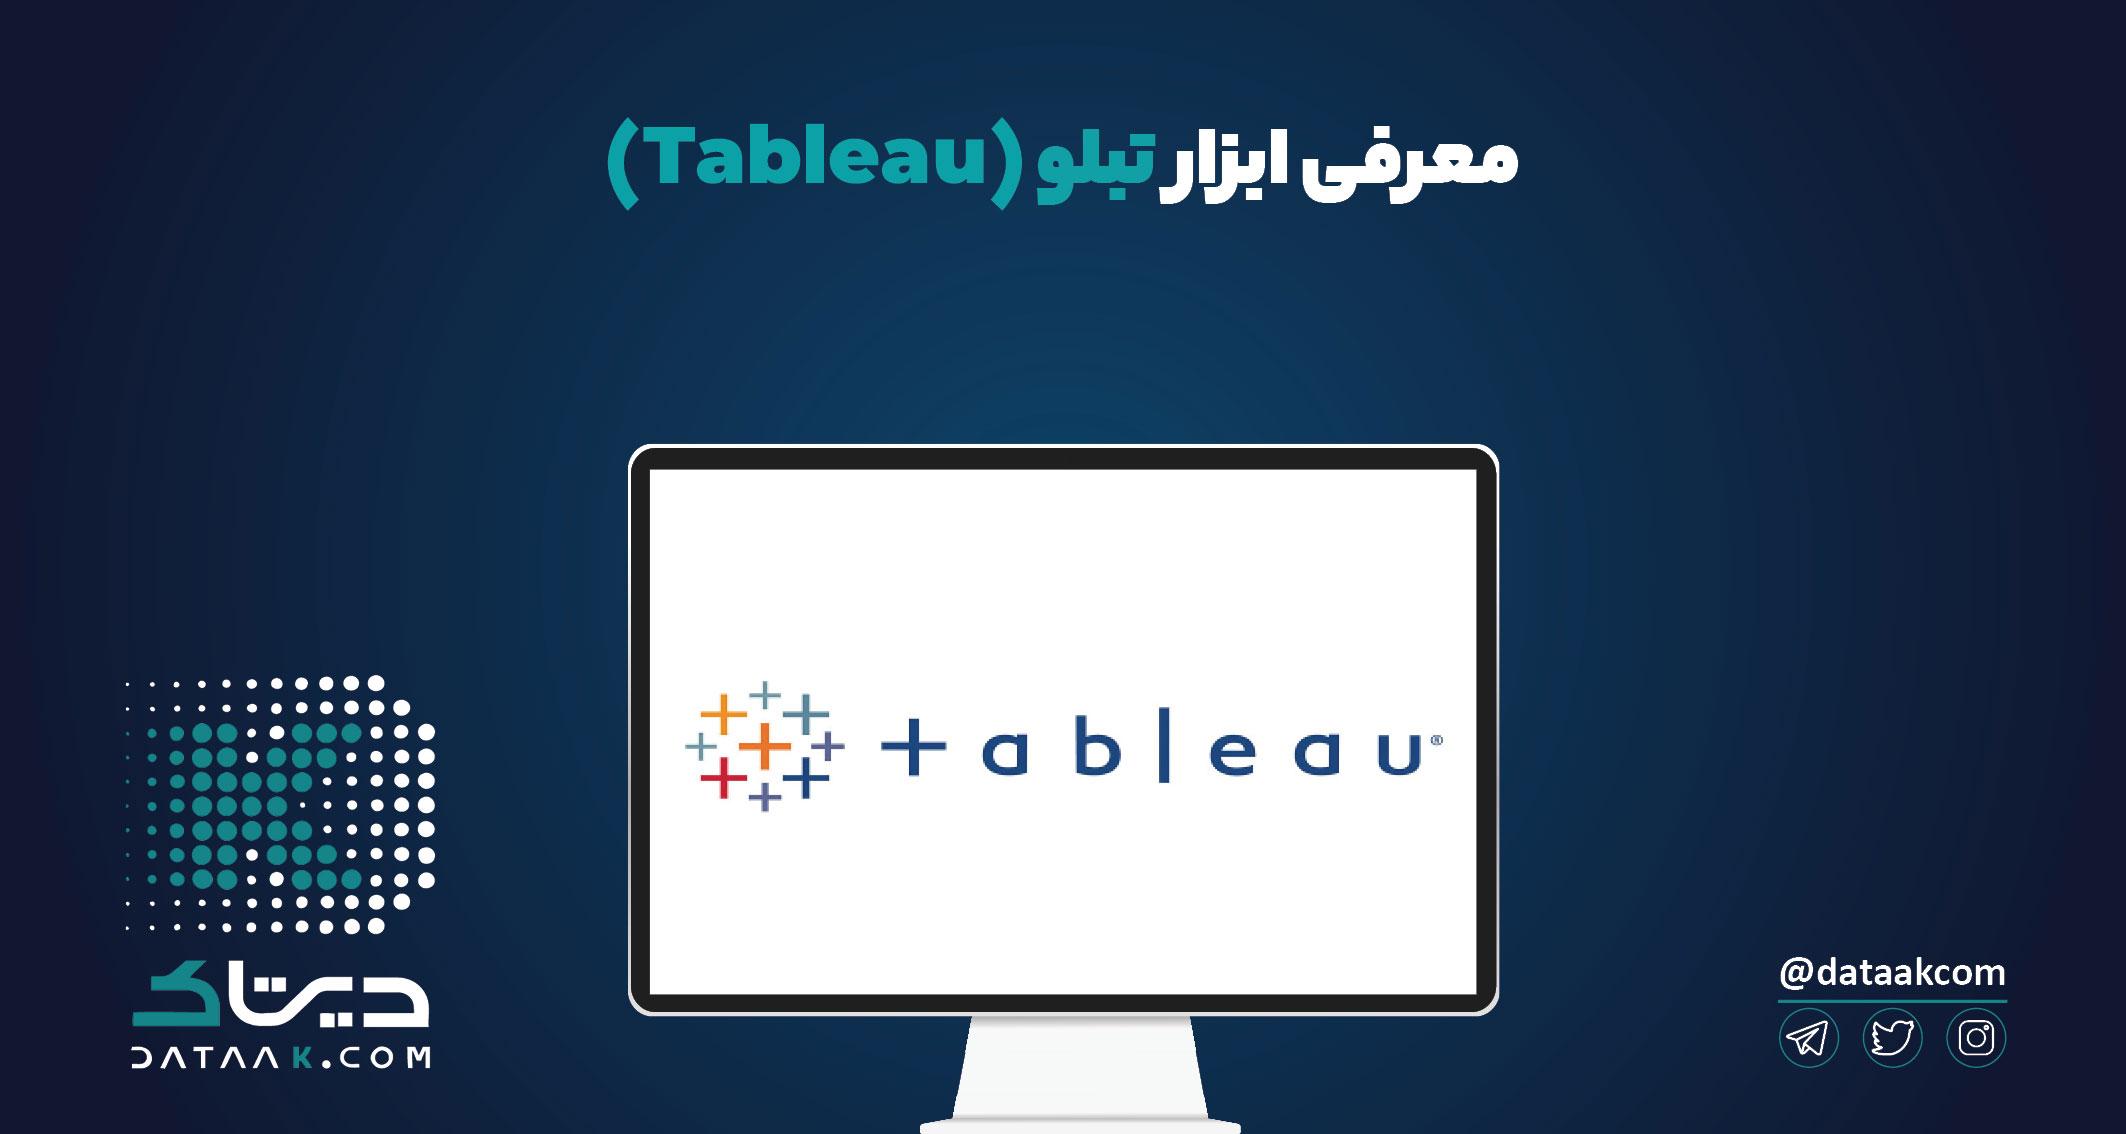 ابزار تبلو Tableau